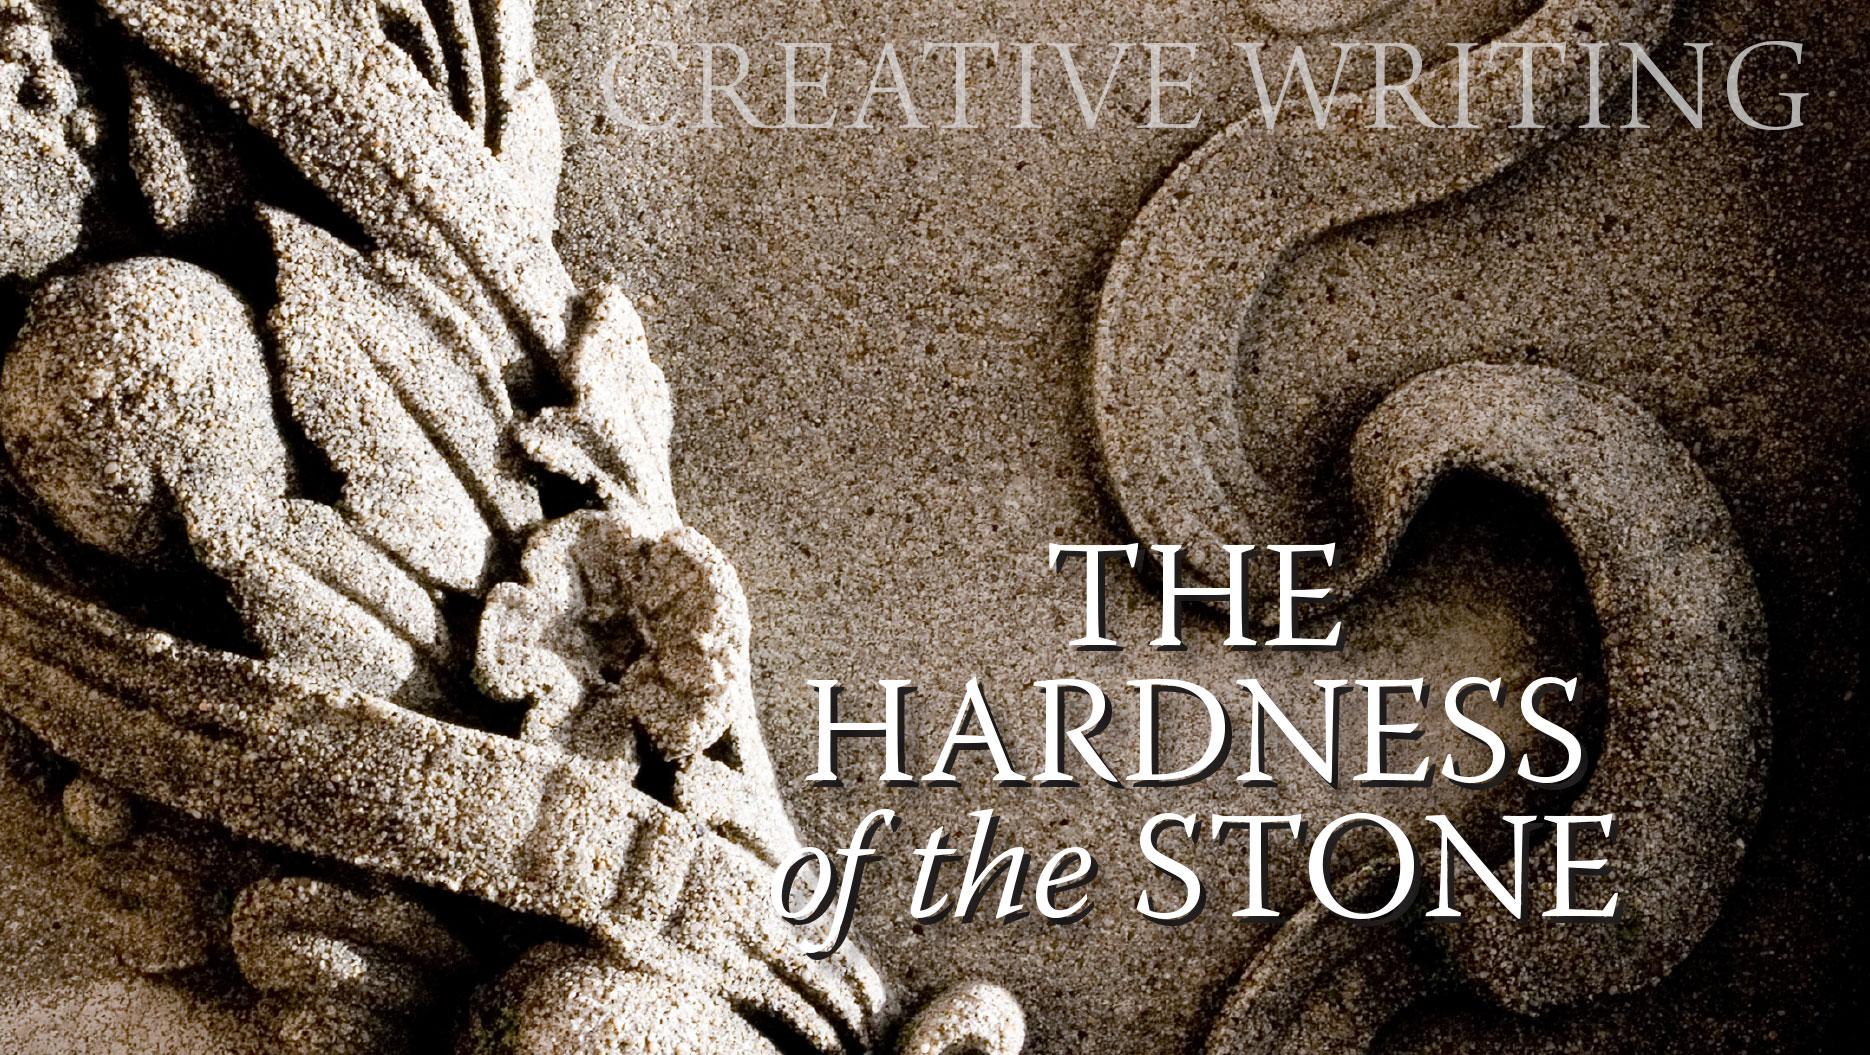 The hardness